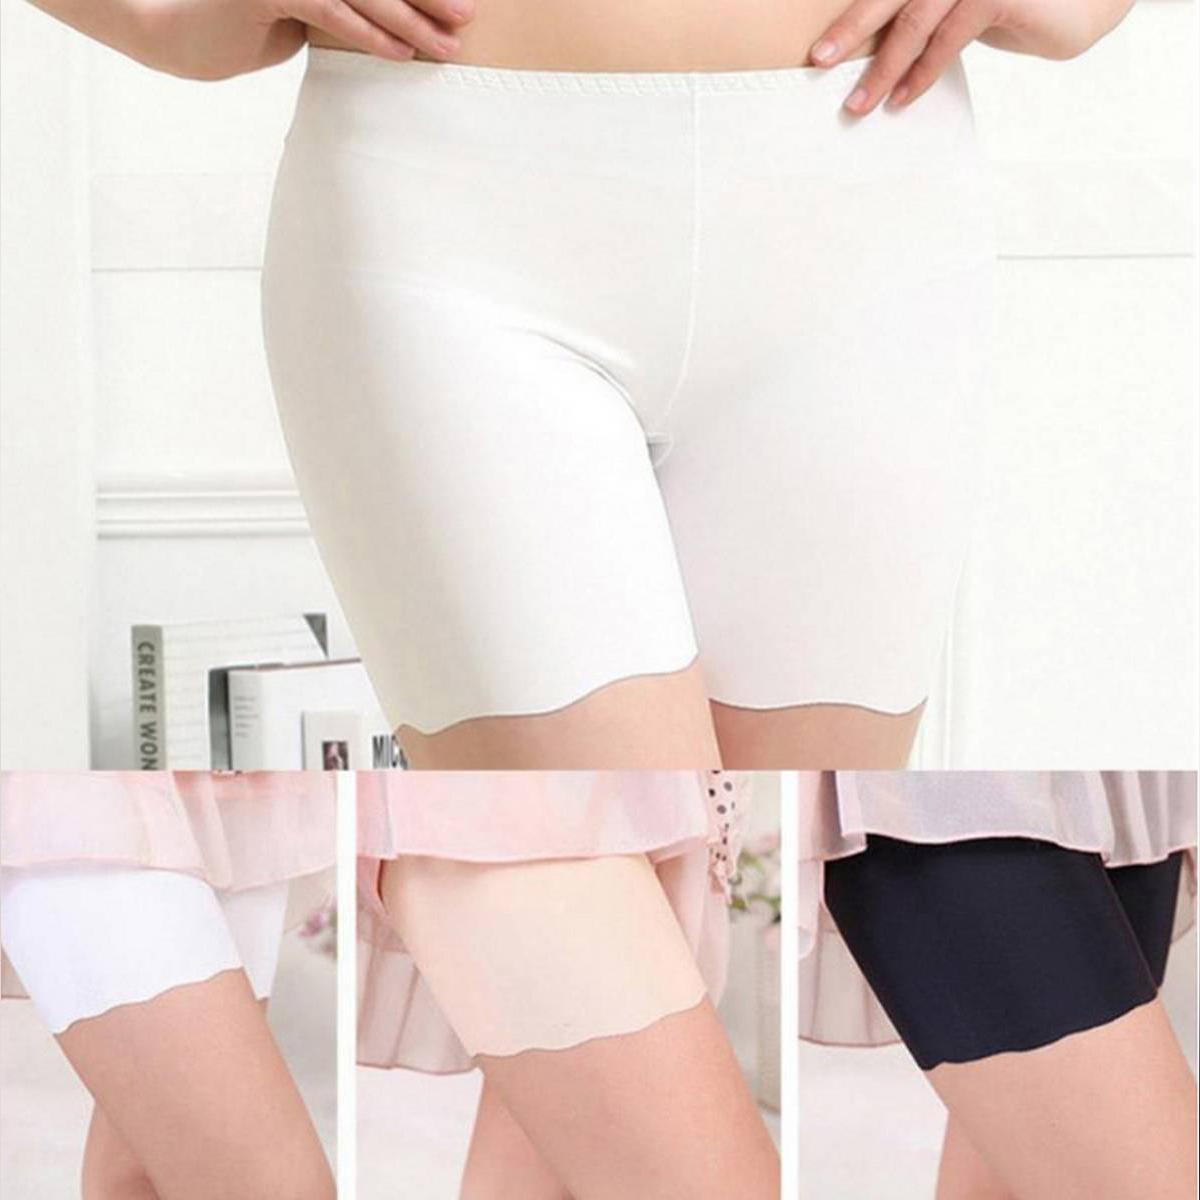 Pack Of 2 - Seamless Slimming Shorts Nylon Underwear